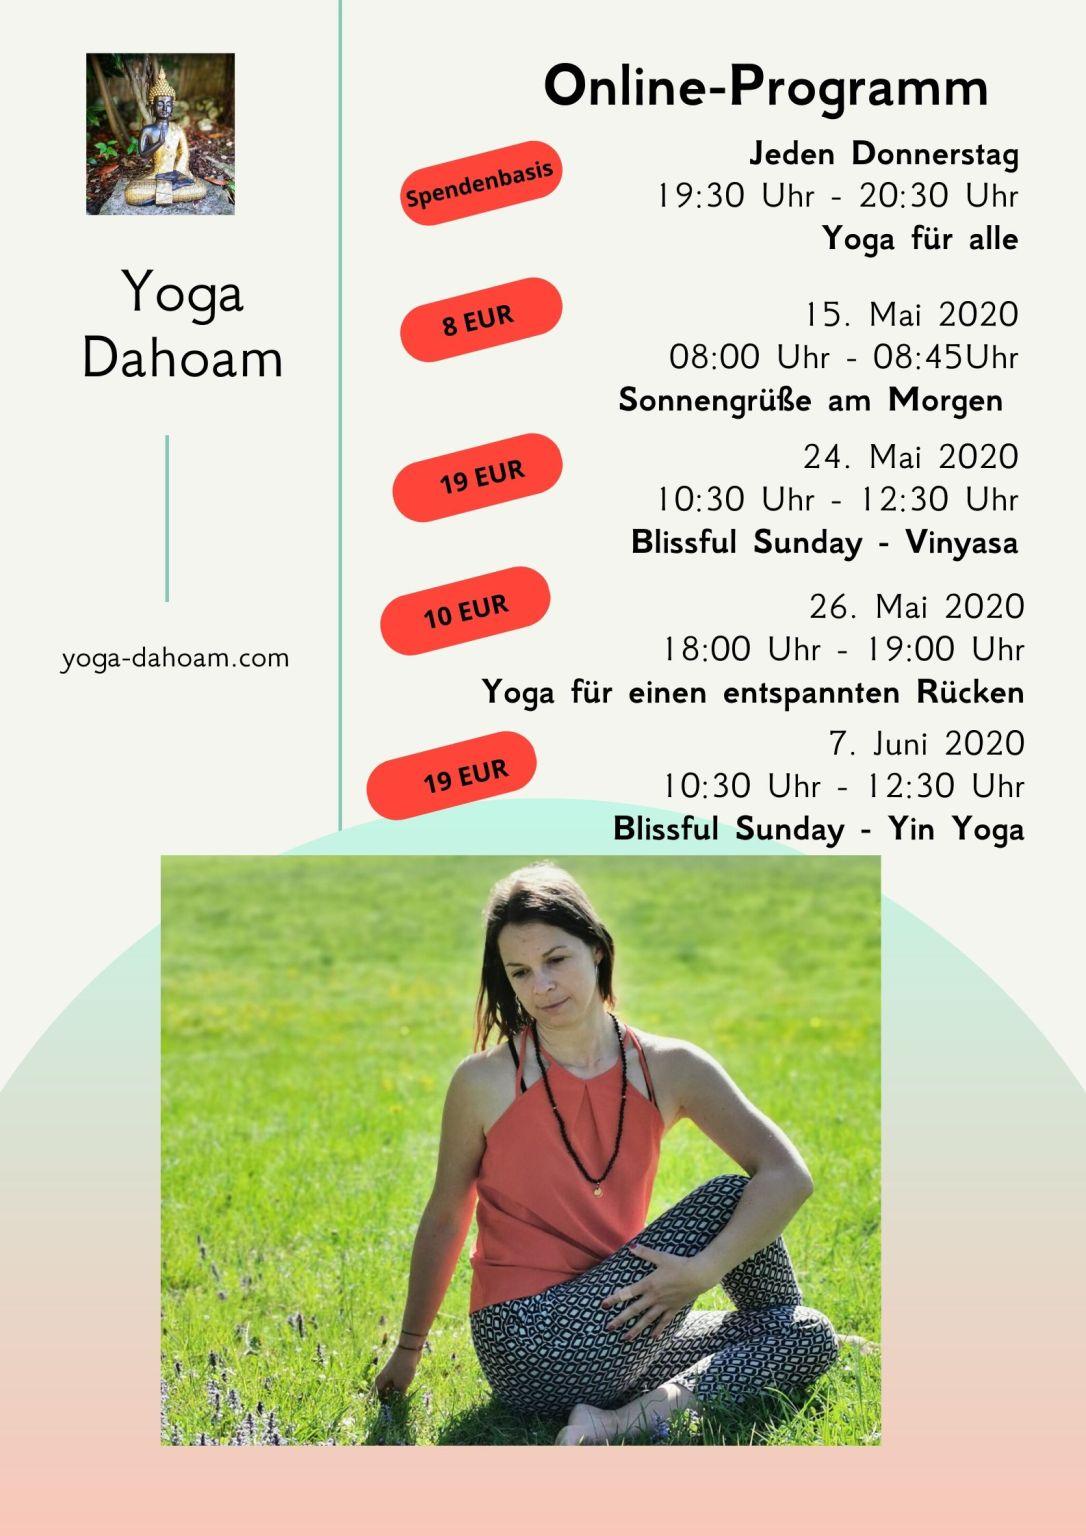 Yoga Dahoam Programm (1)